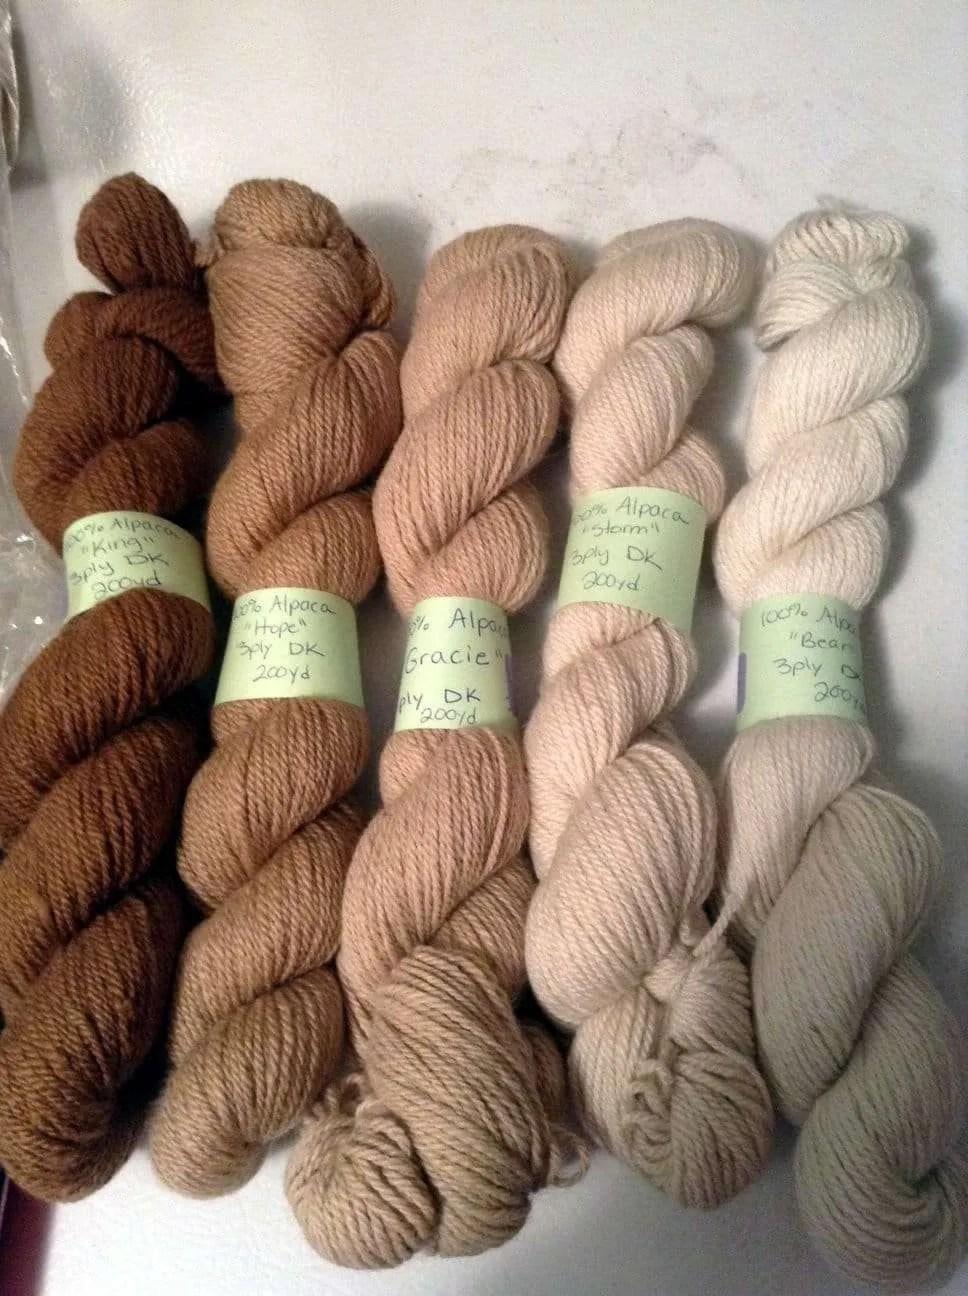 Blackberry Ridge Farm alpaca yarn - Wolcott, VT 05680